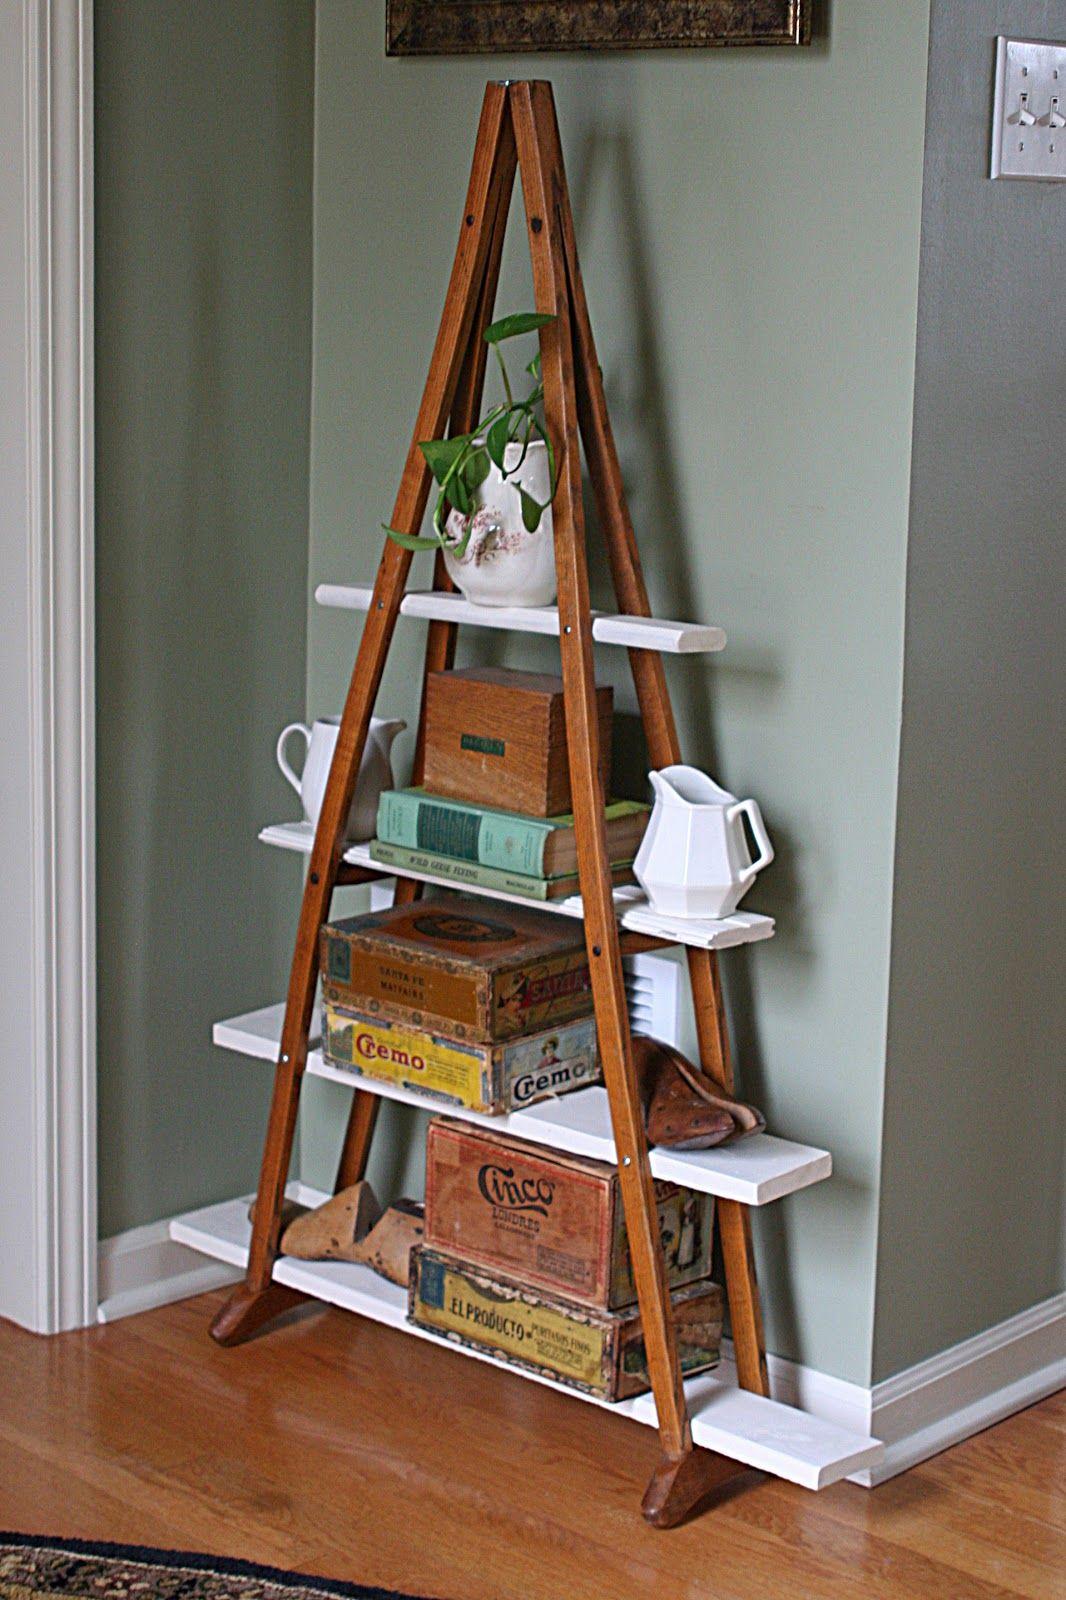 Diy Wooden Crutches Made Into Unique Shelving Diy Craft Ideas